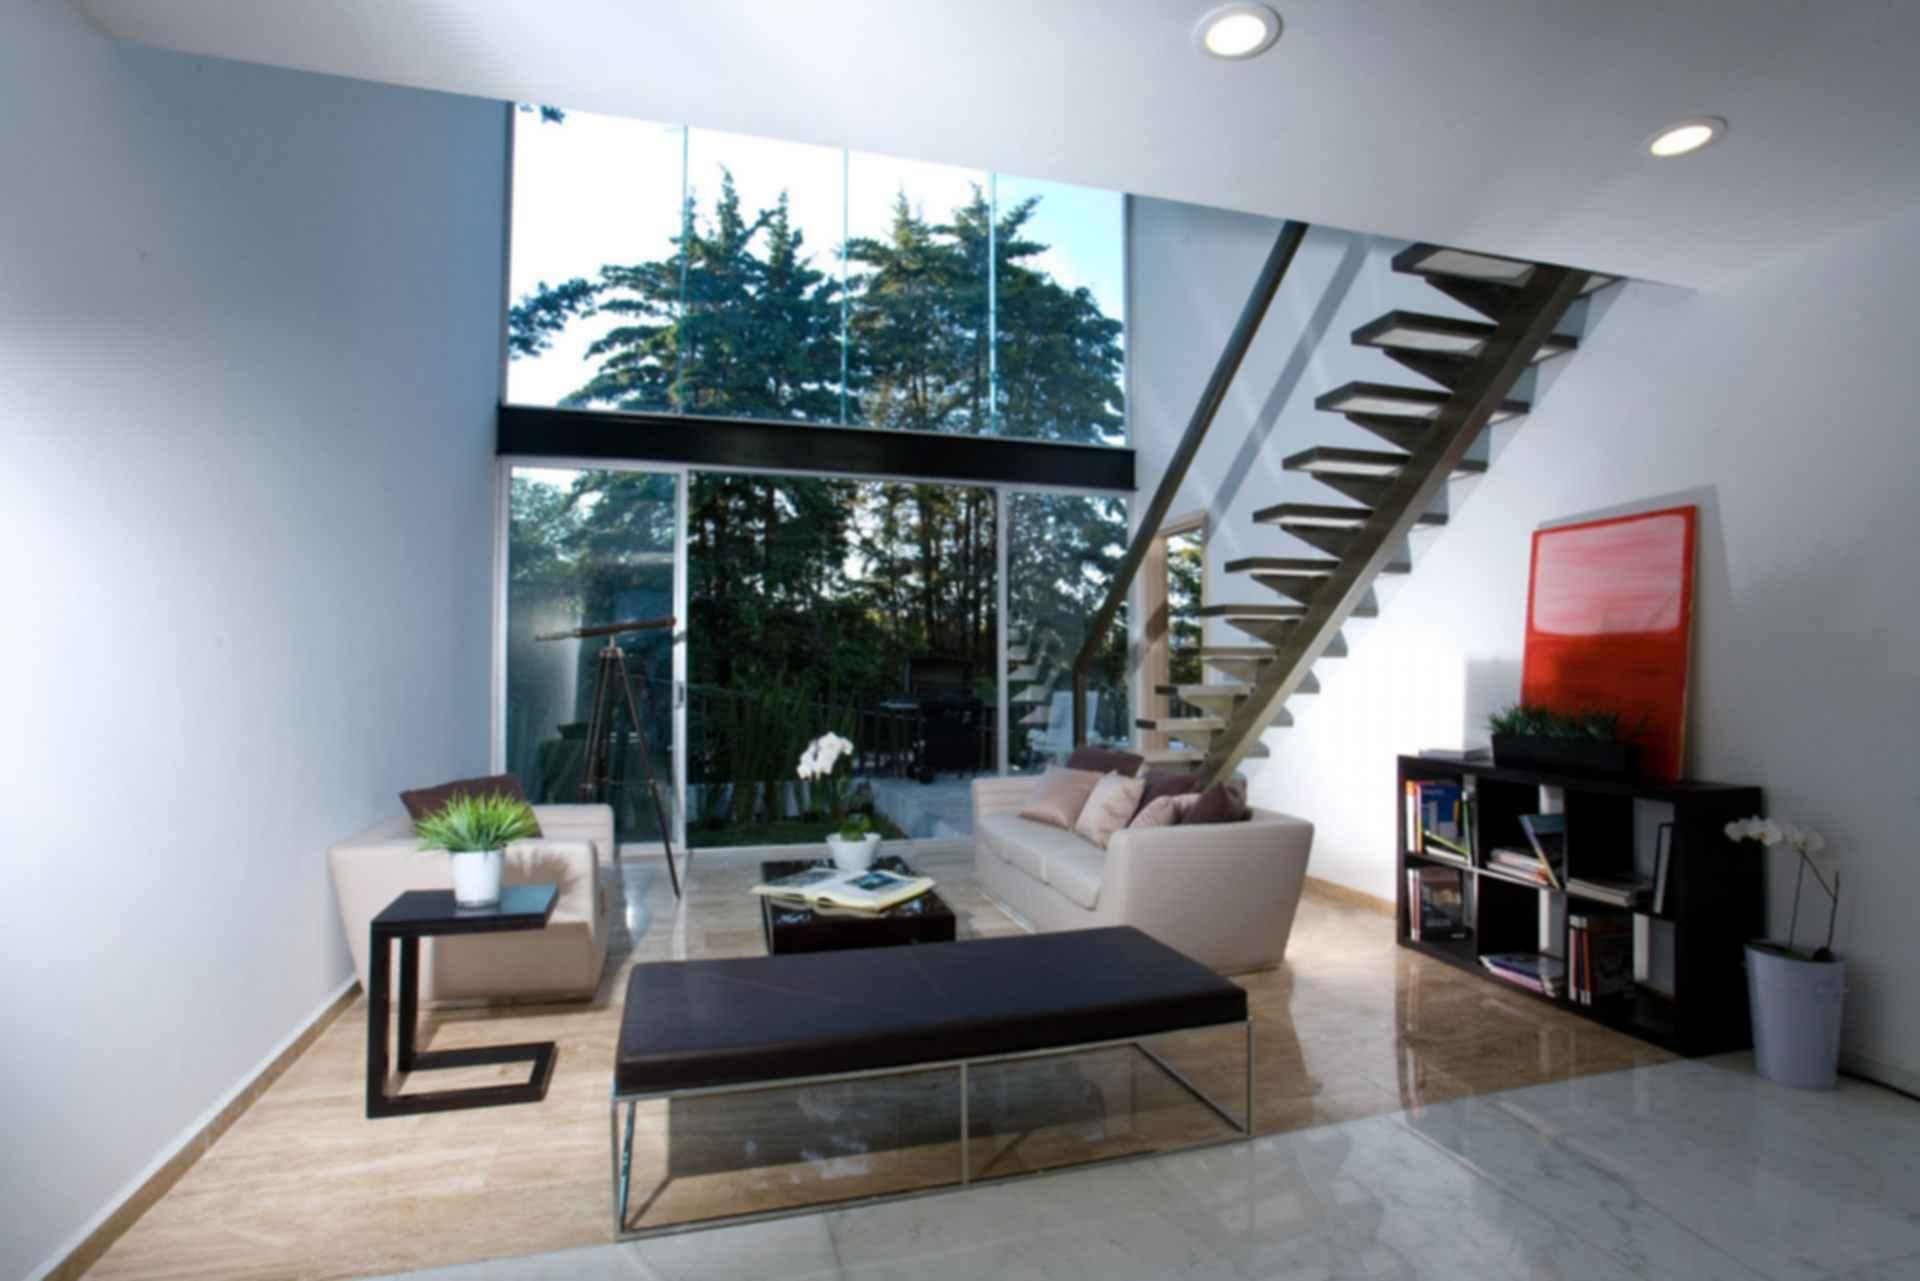 Trevox Apartments - Interior